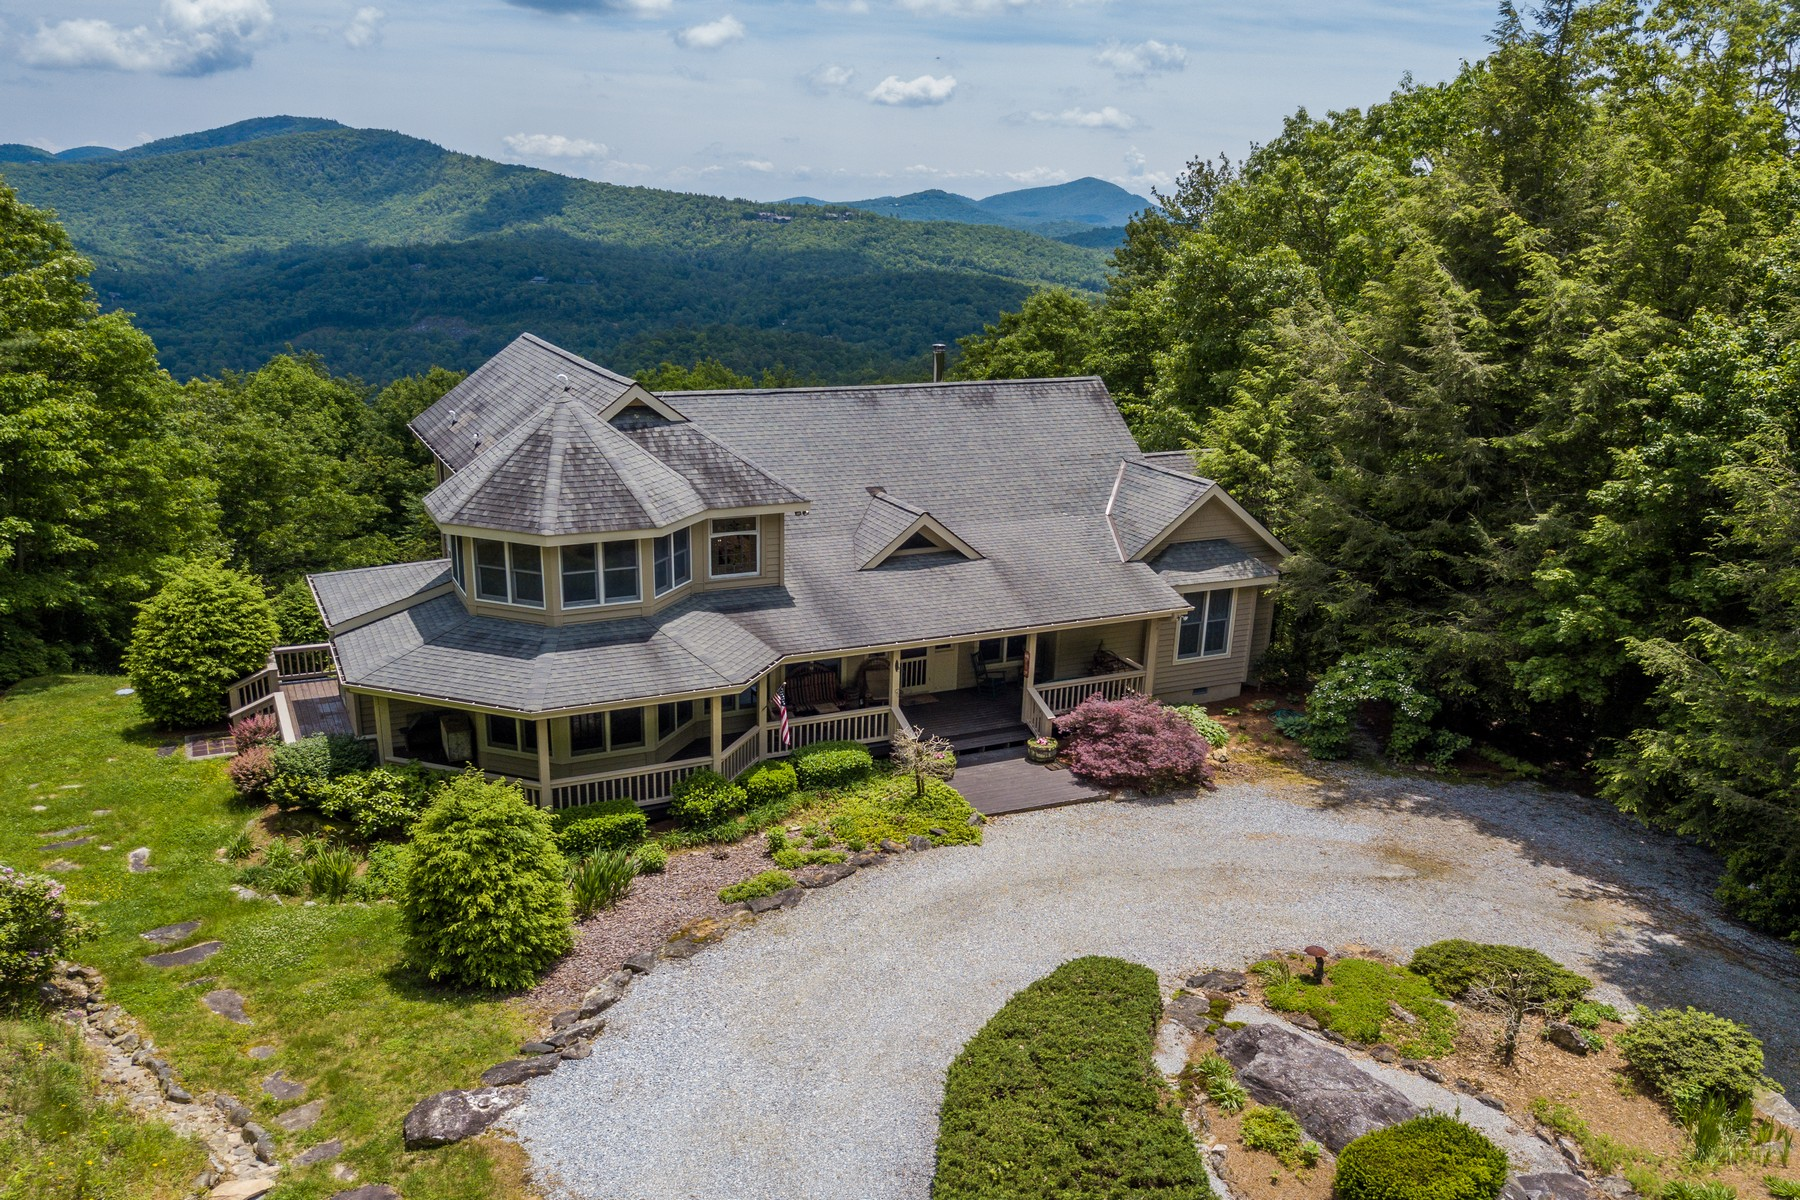 Single Family Homes for Active at 435 Treasurewood Road Glenville, North Carolina 28736 United States